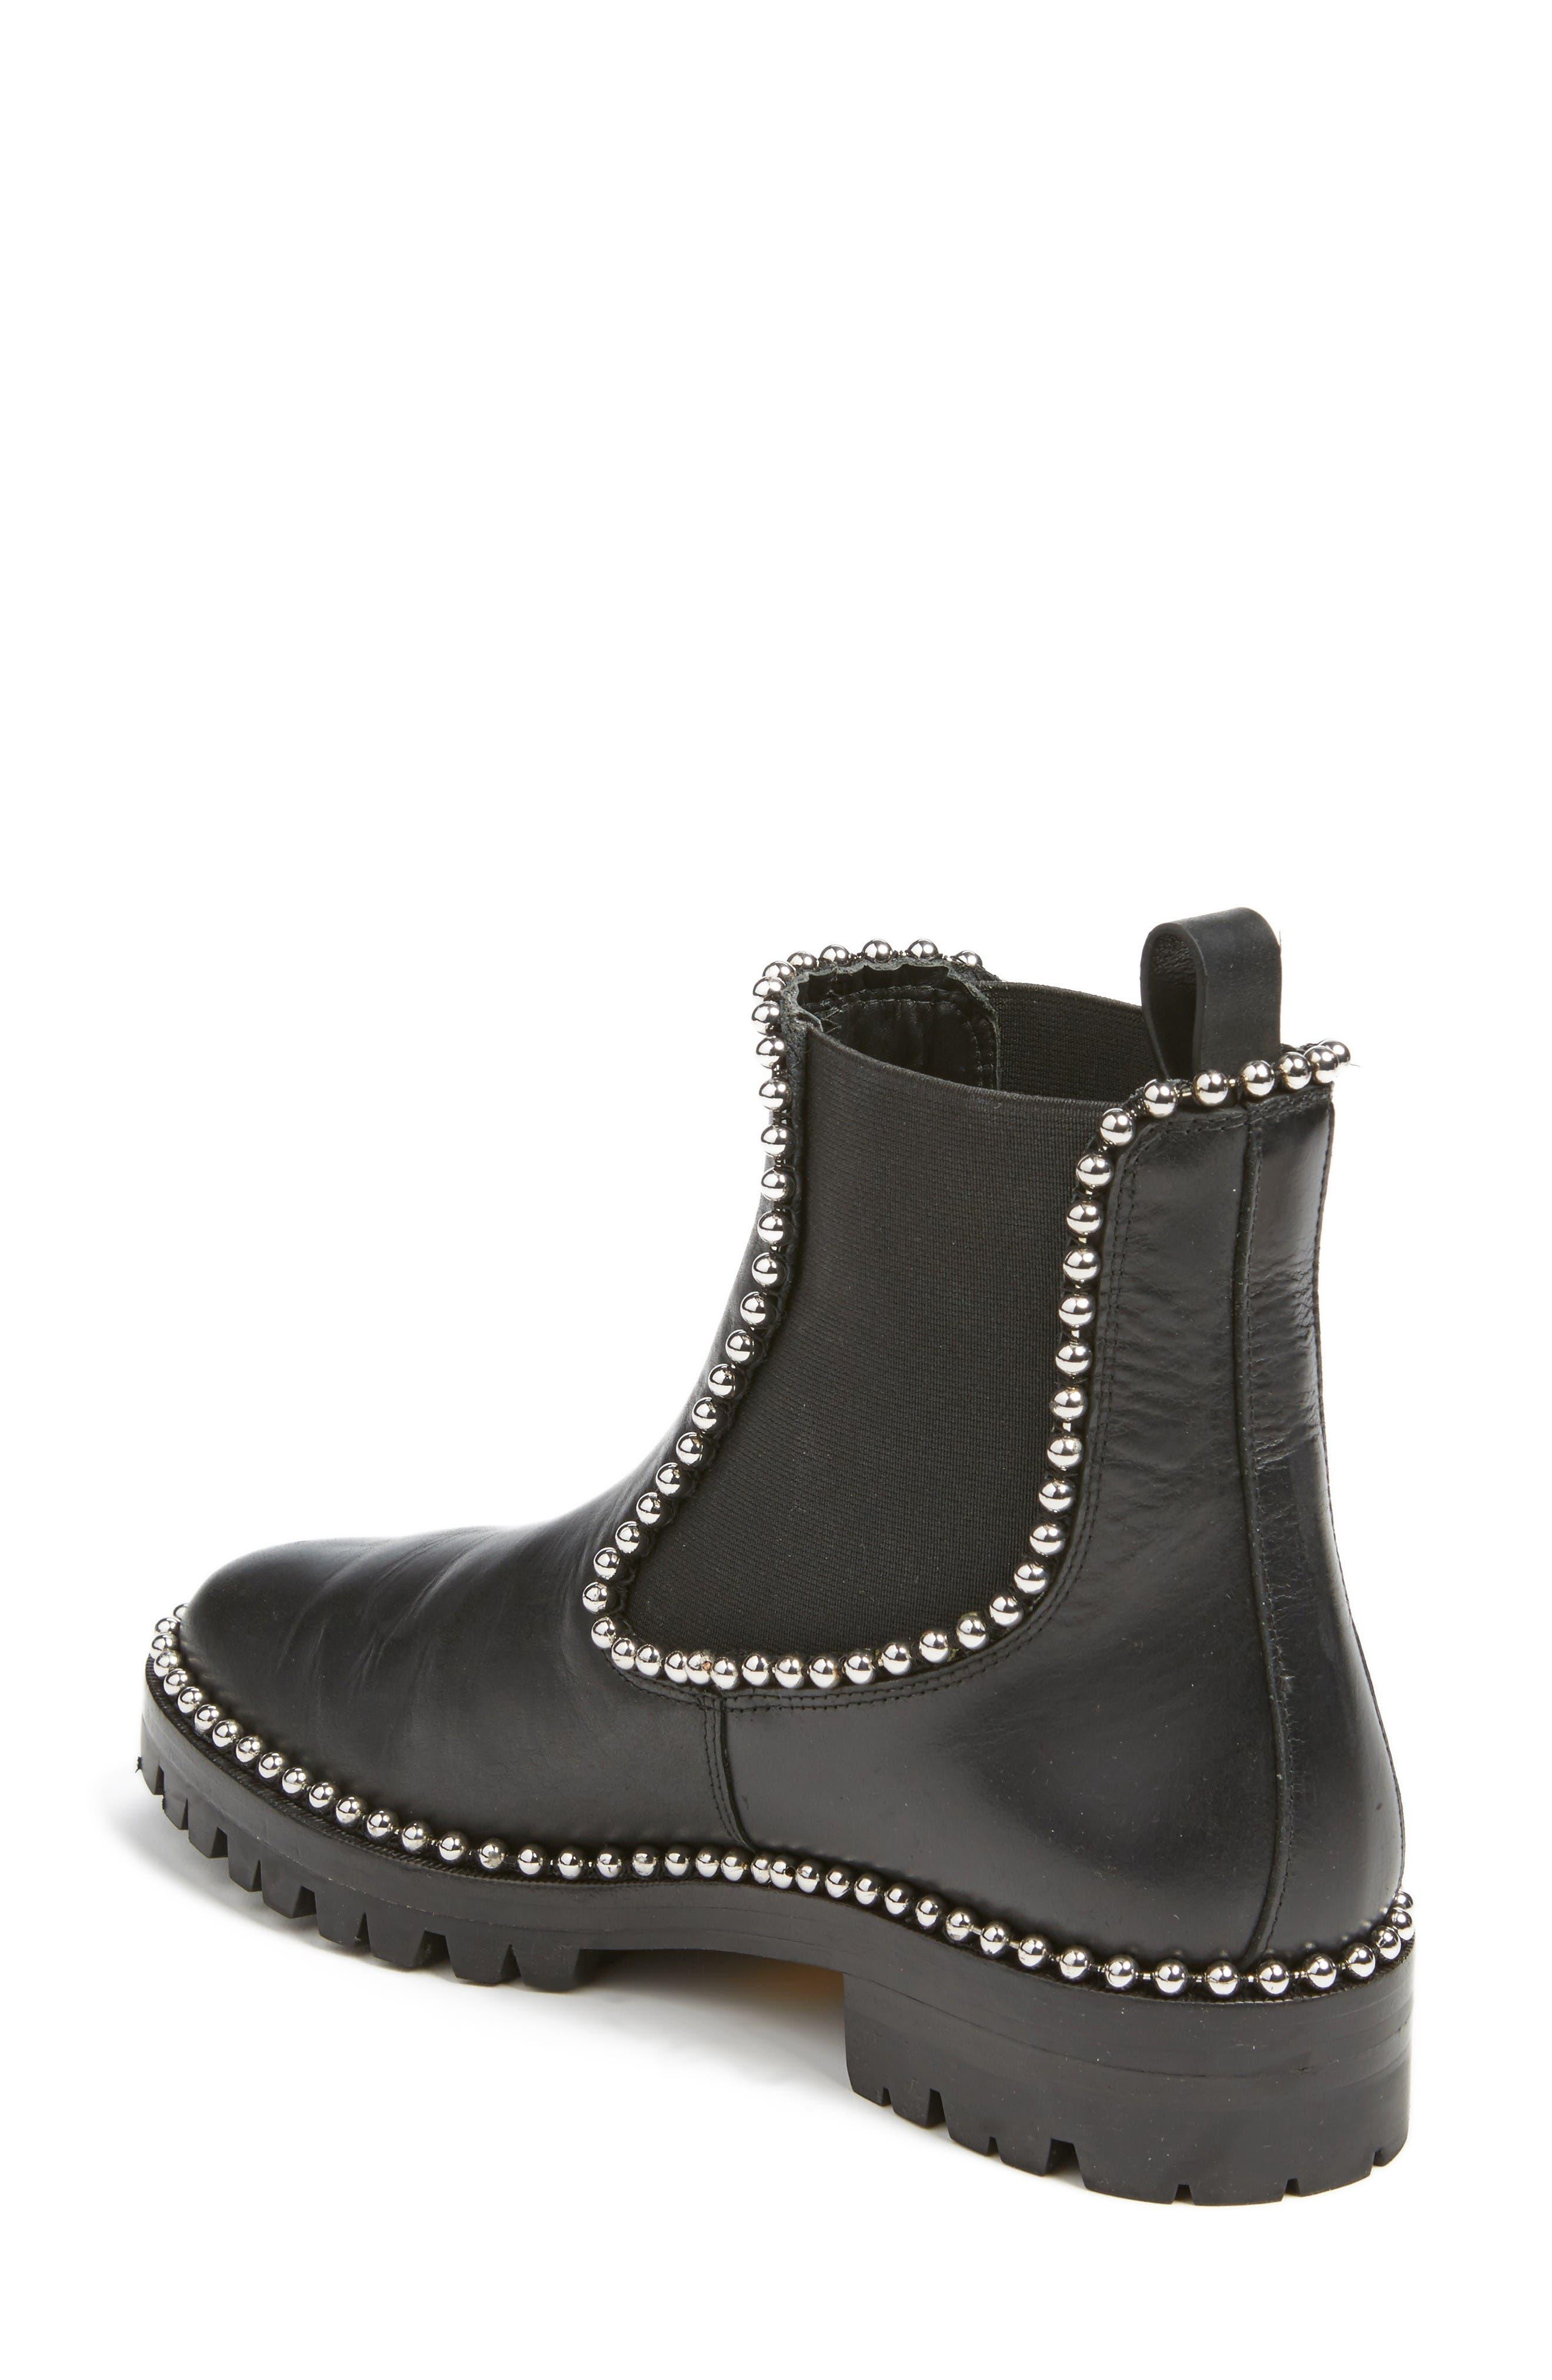 Spencer Chelsea Boot,                             Alternate thumbnail 2, color,                             Black Leather